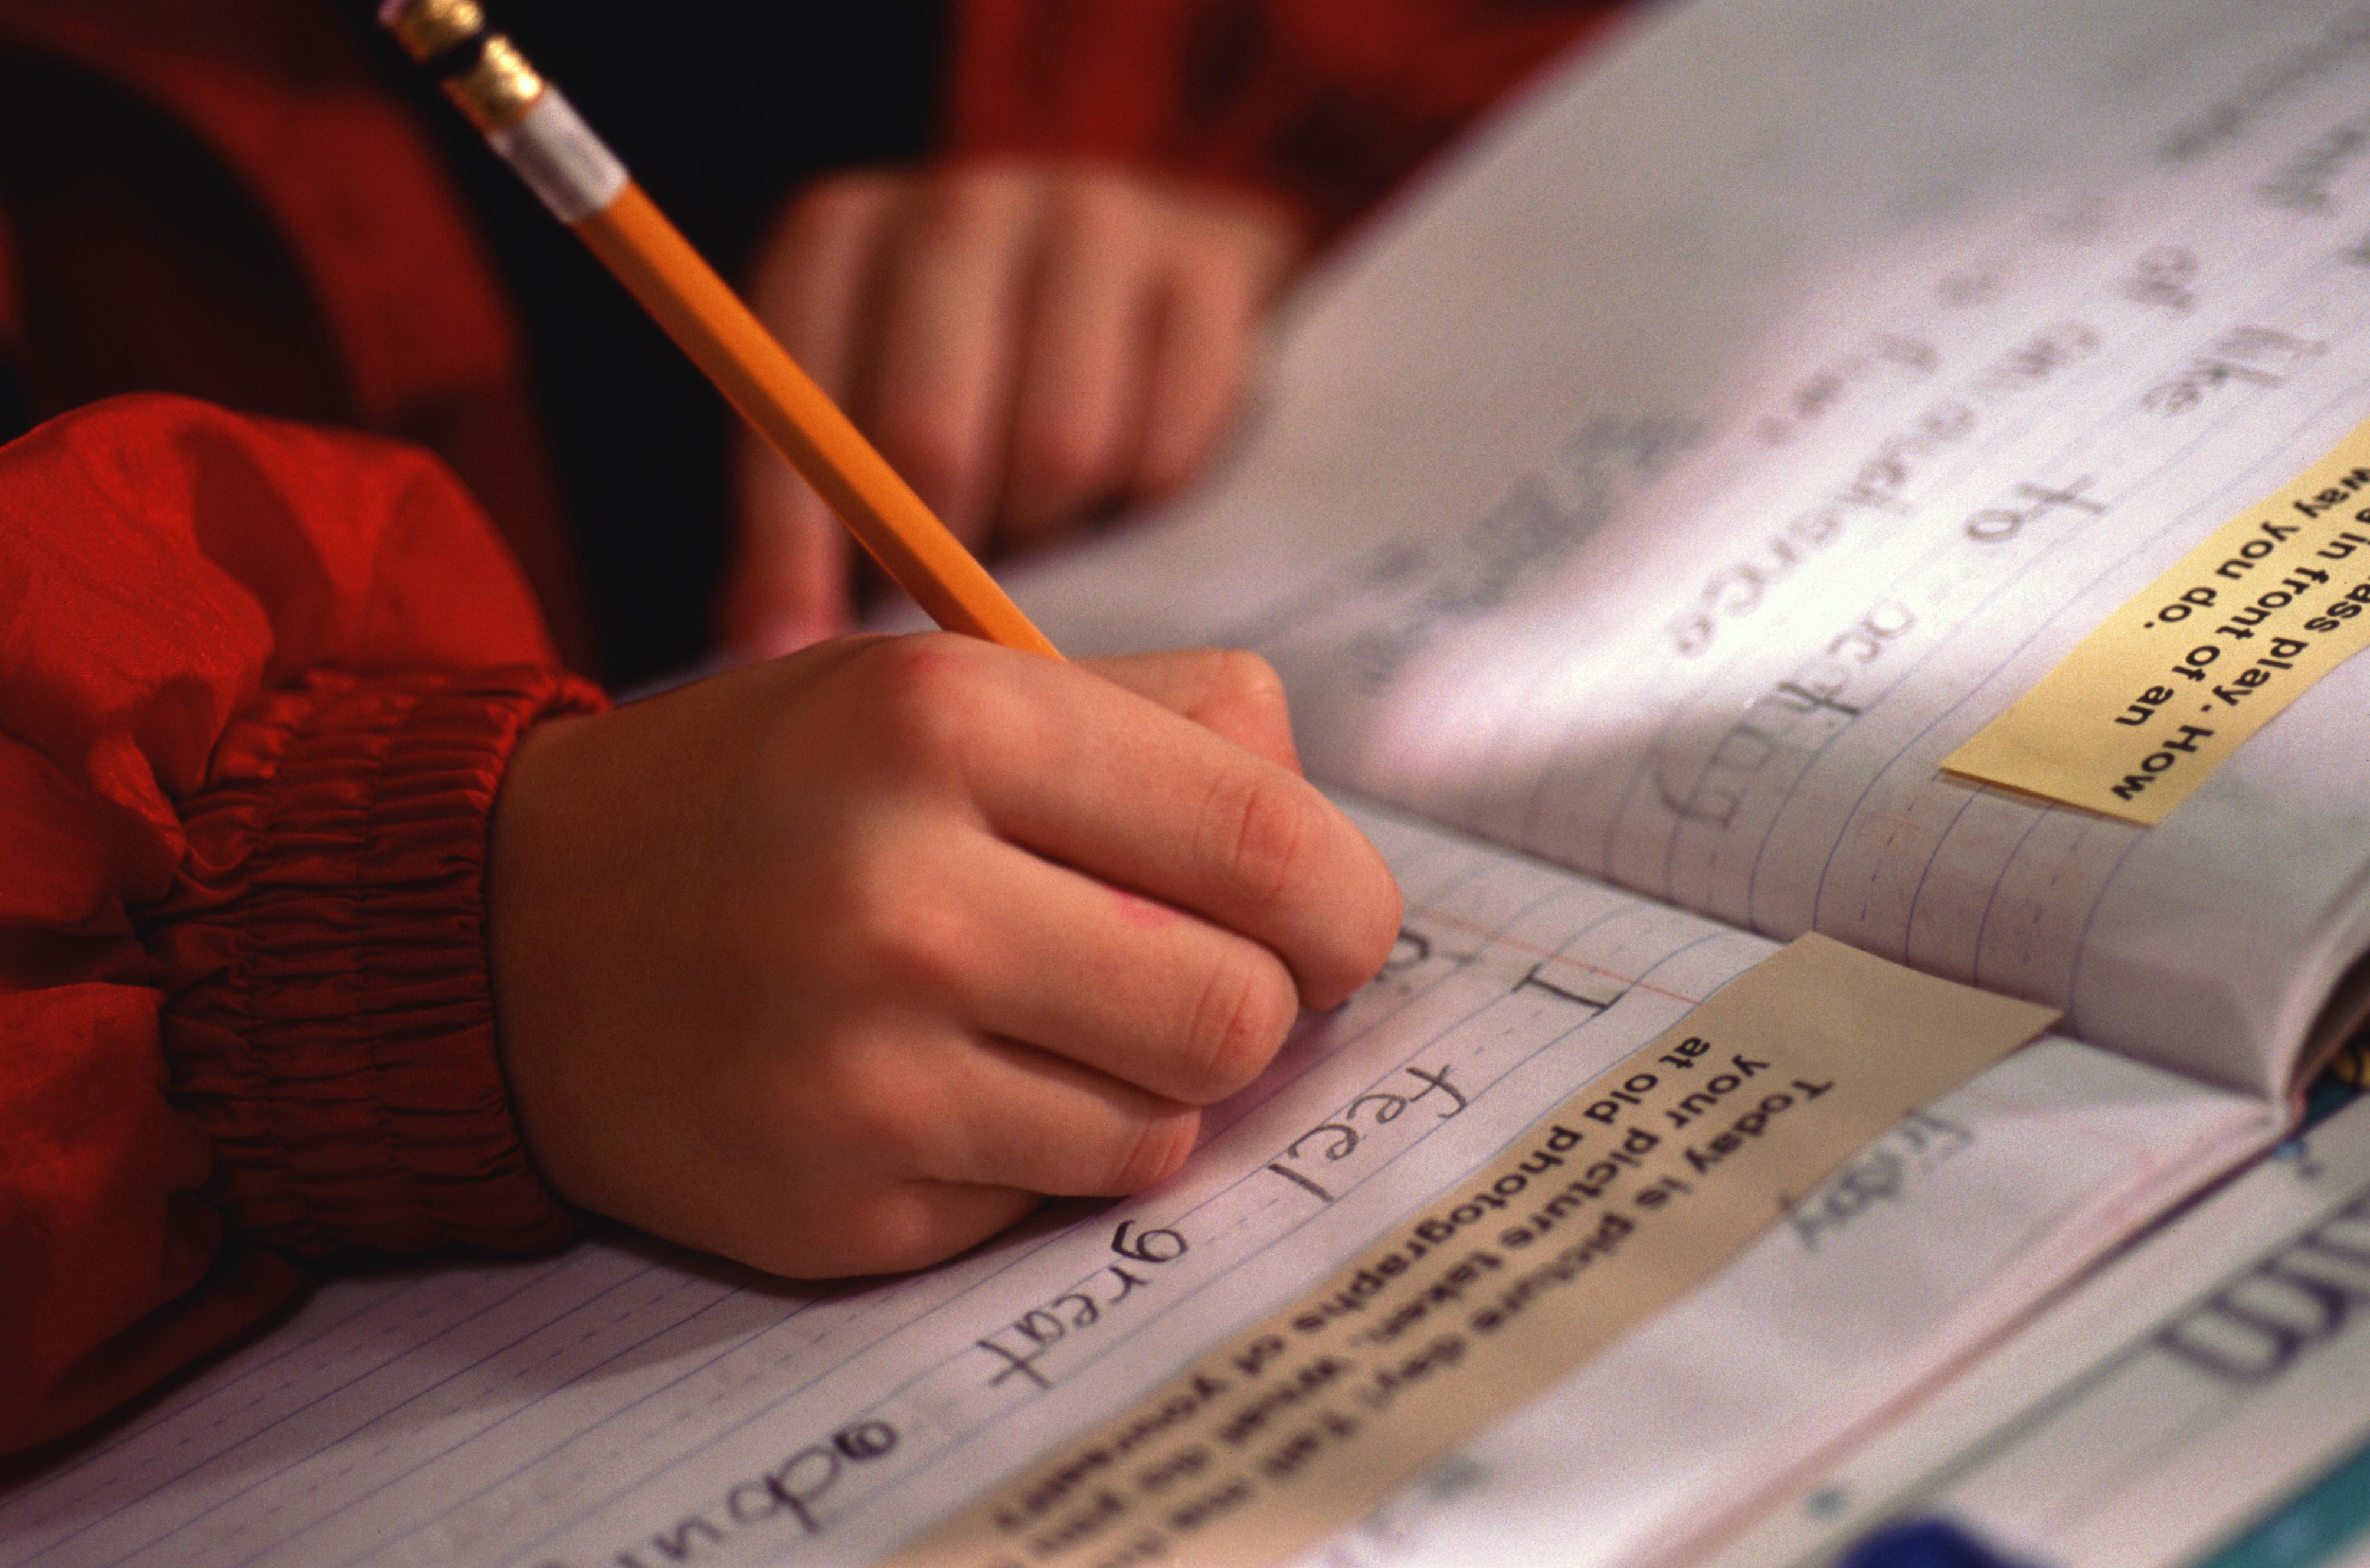 Boy doing homework, mid section